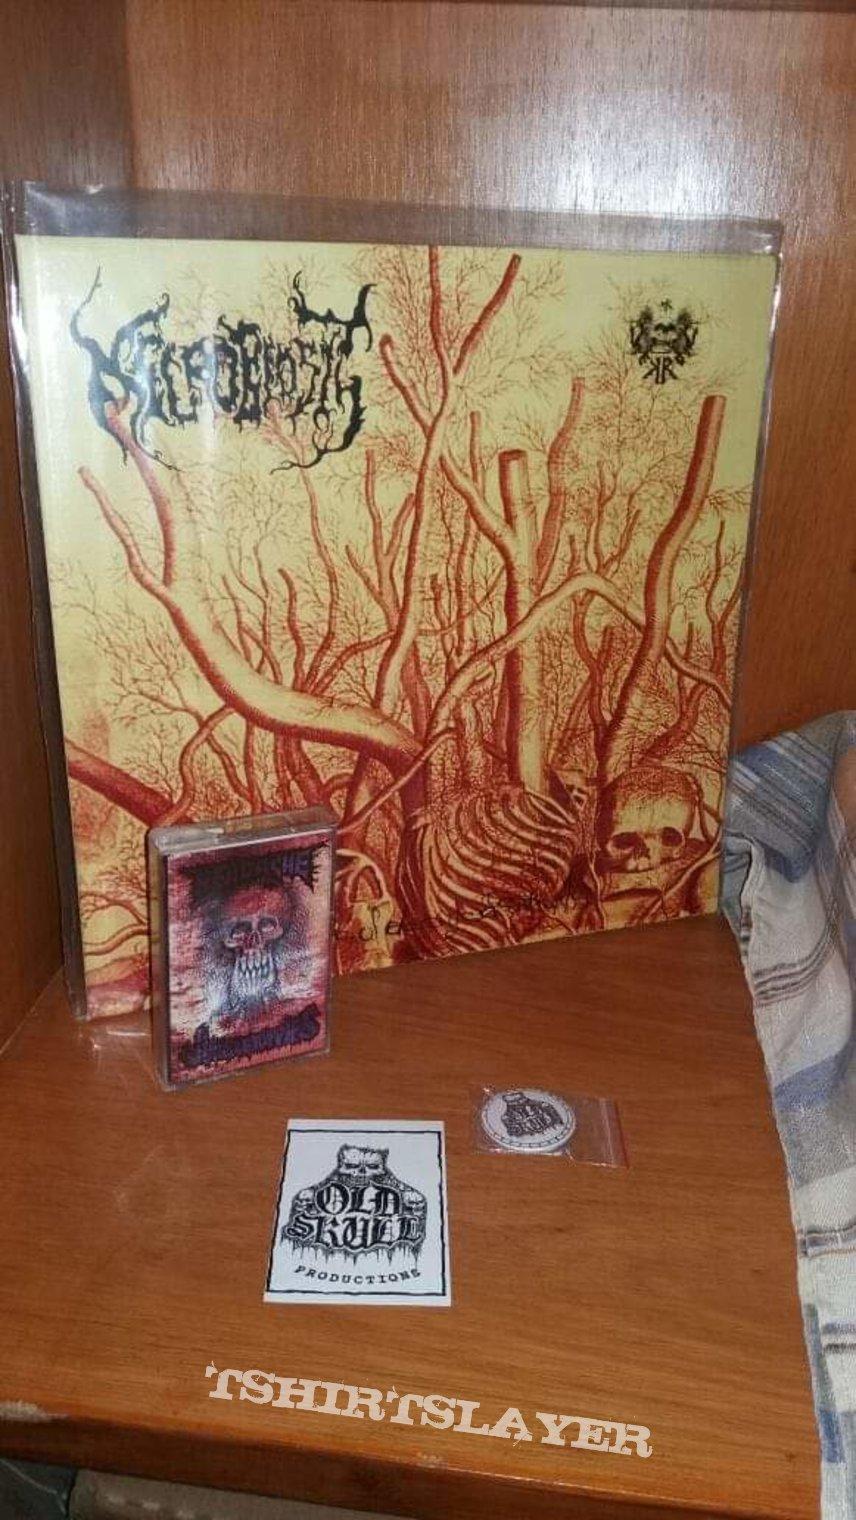 Finnish death metal grindcore